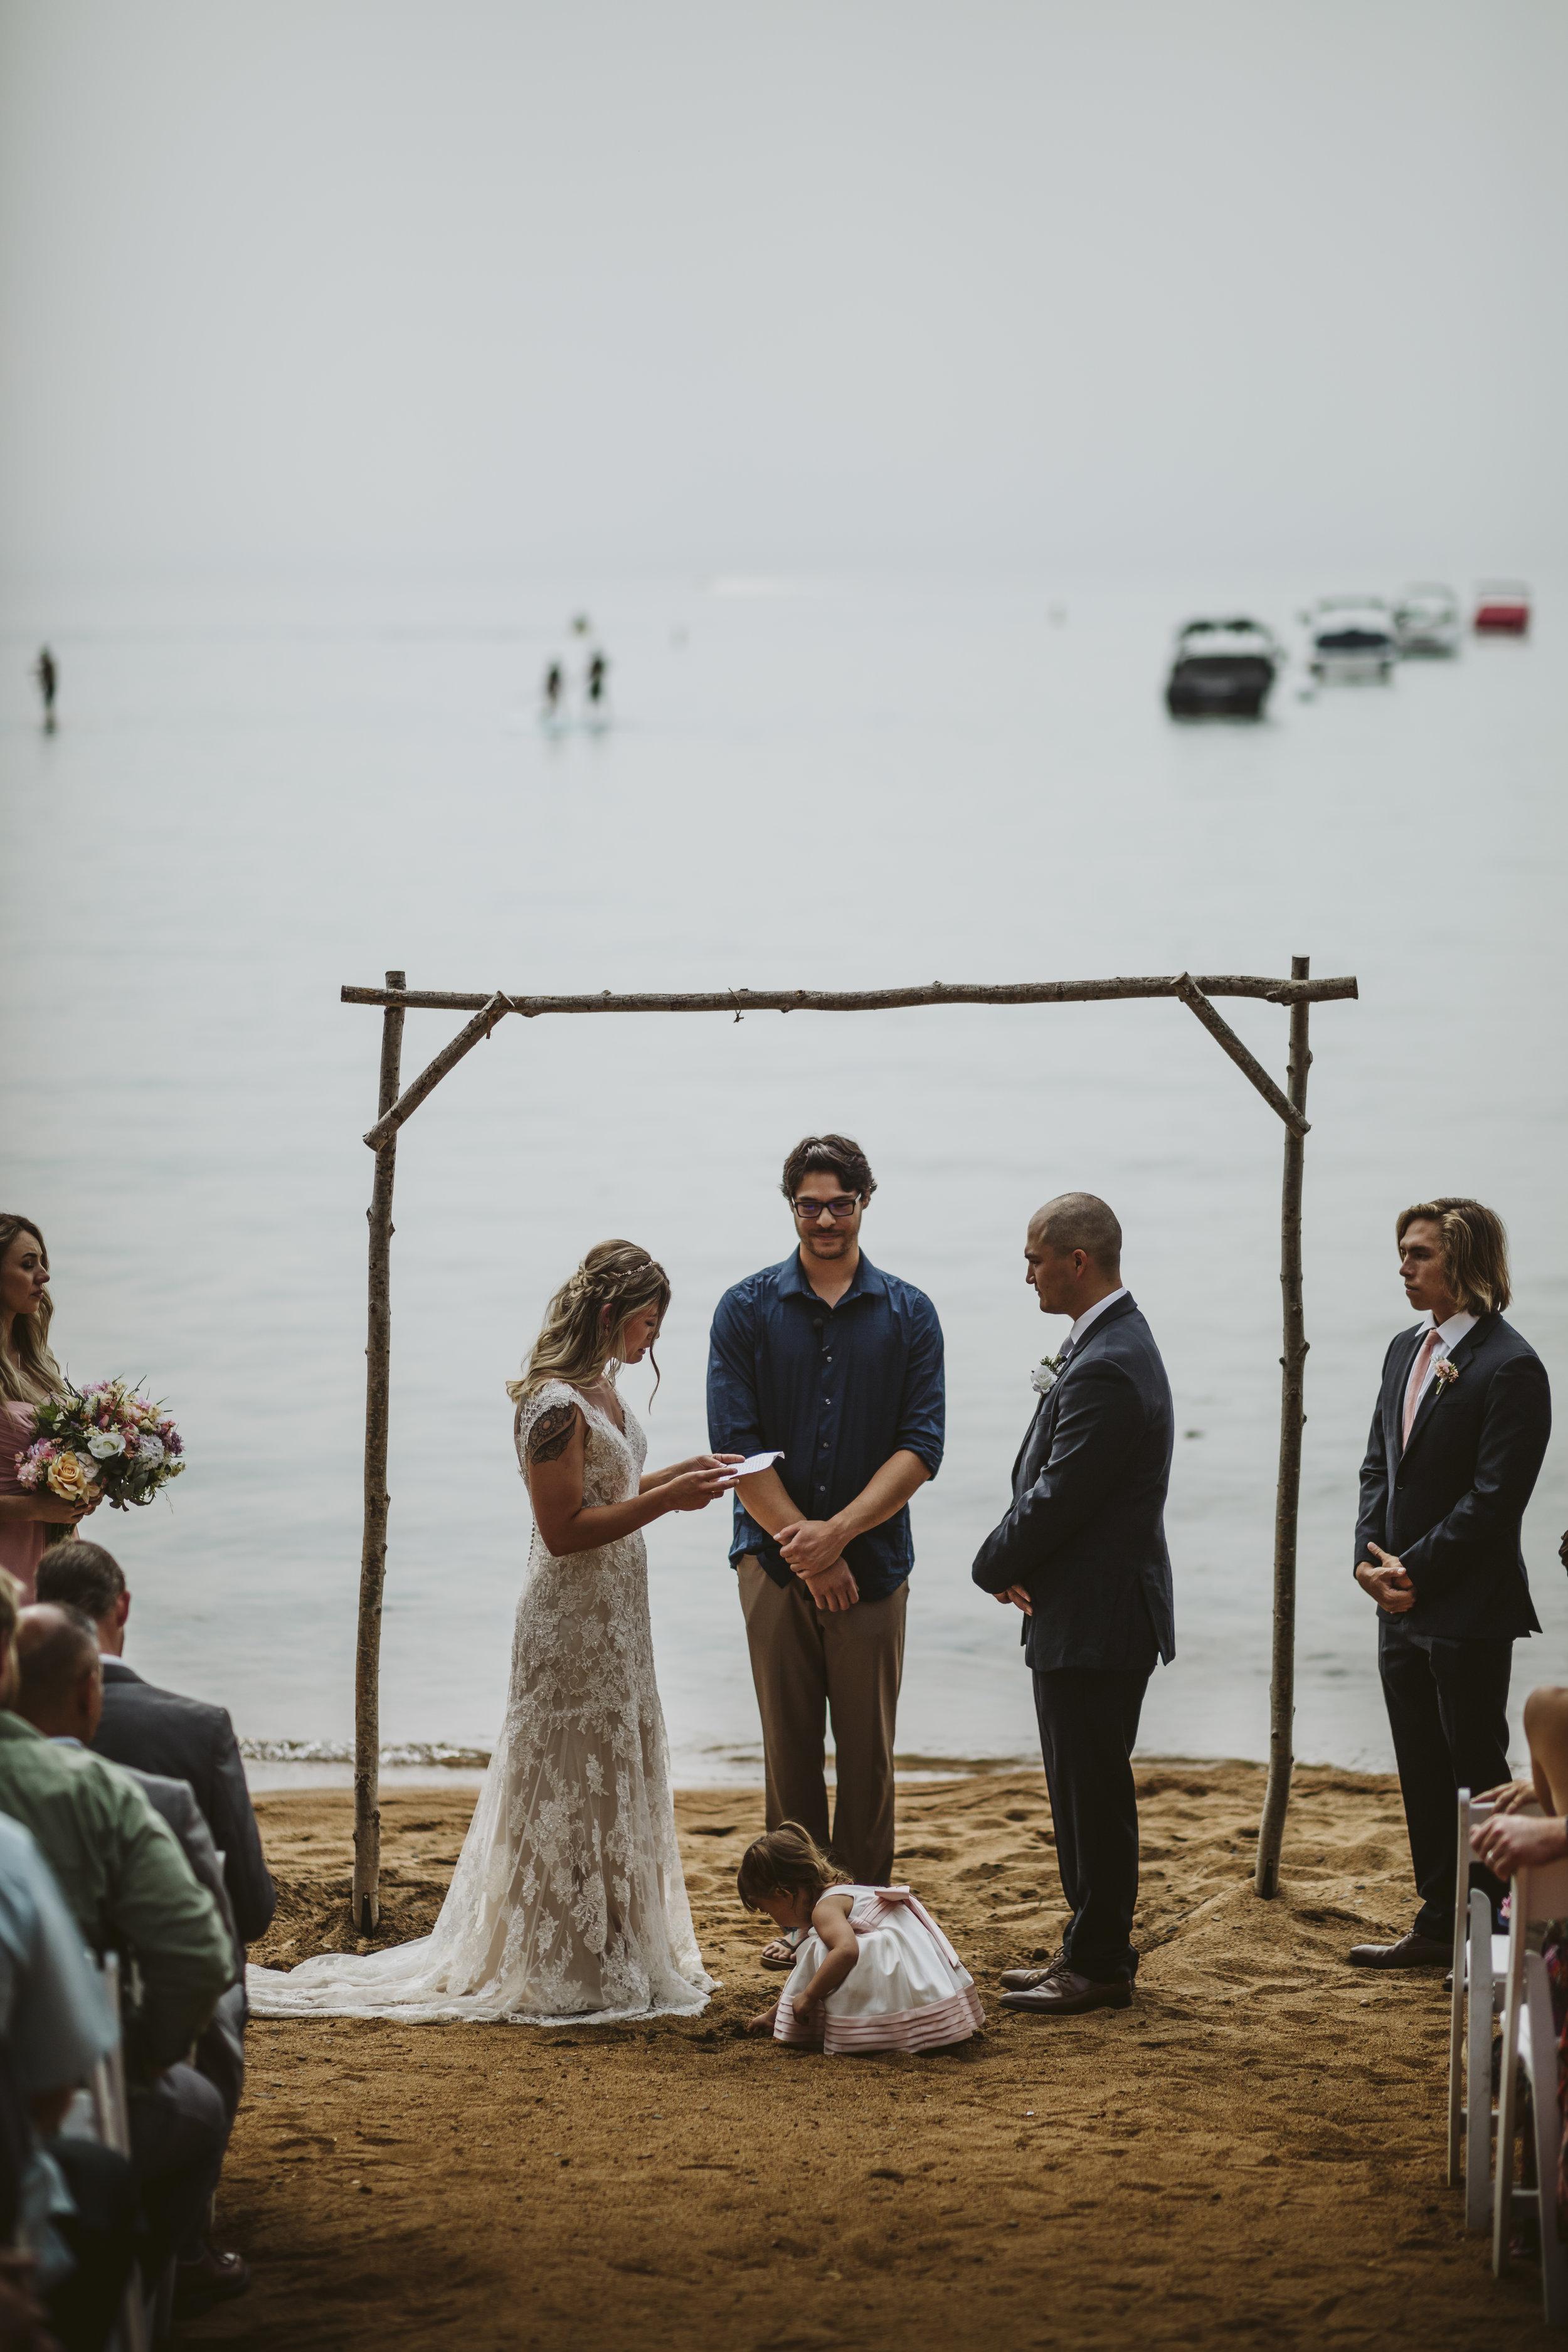 _P8A4245vild-vild photography-photography-wedding-wedding photography-tahoe-lake tahoe-lake tahoe wedding photographer-nevada wedding photographer-mountain wedding.jpg